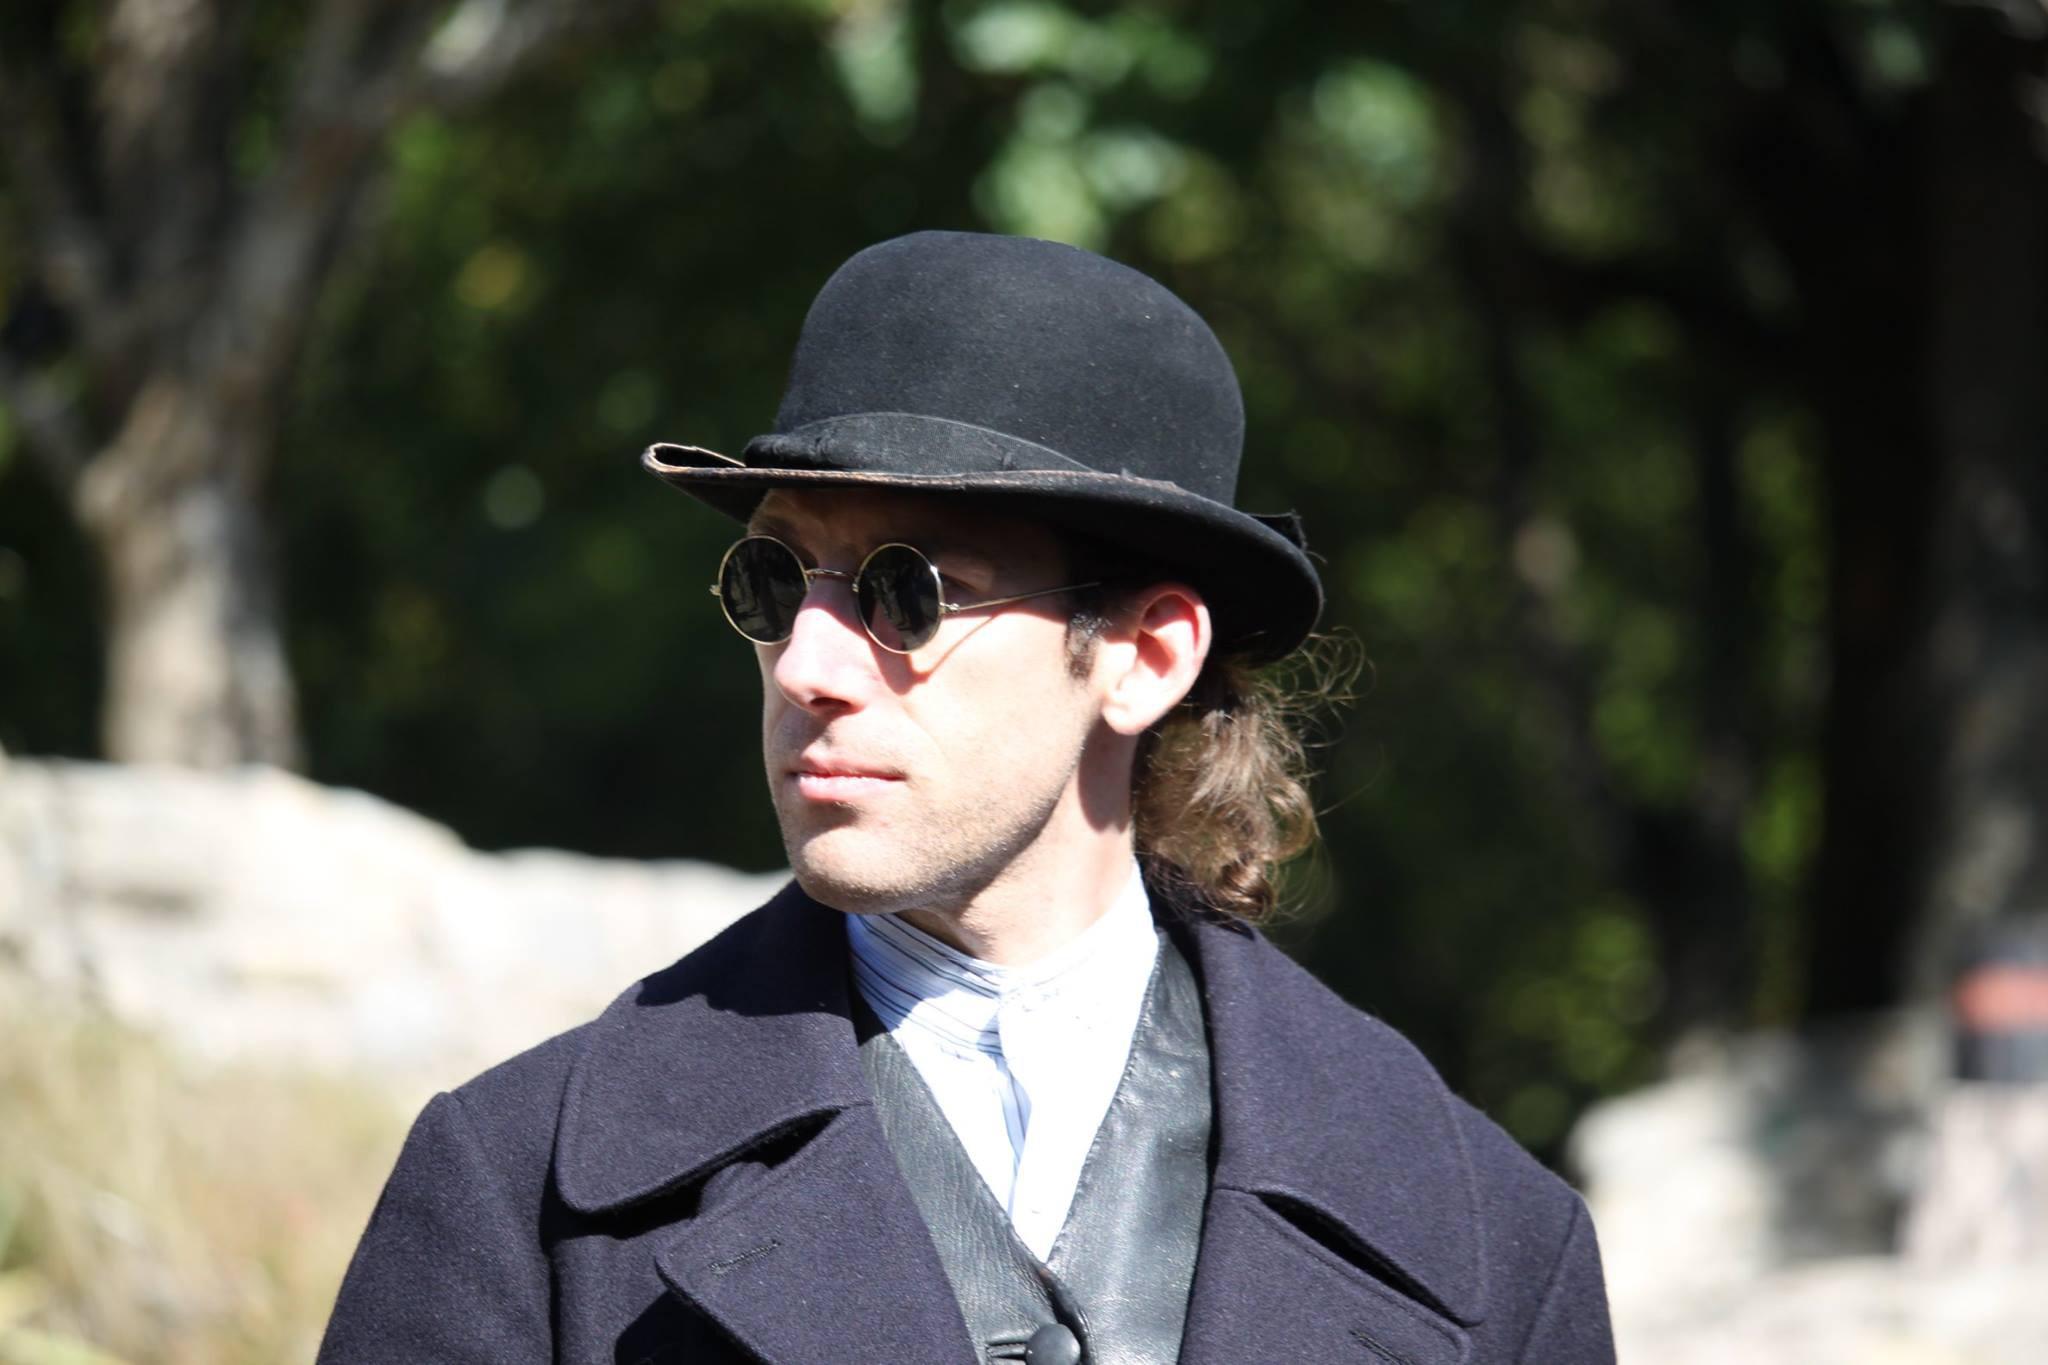 Damian Eicker